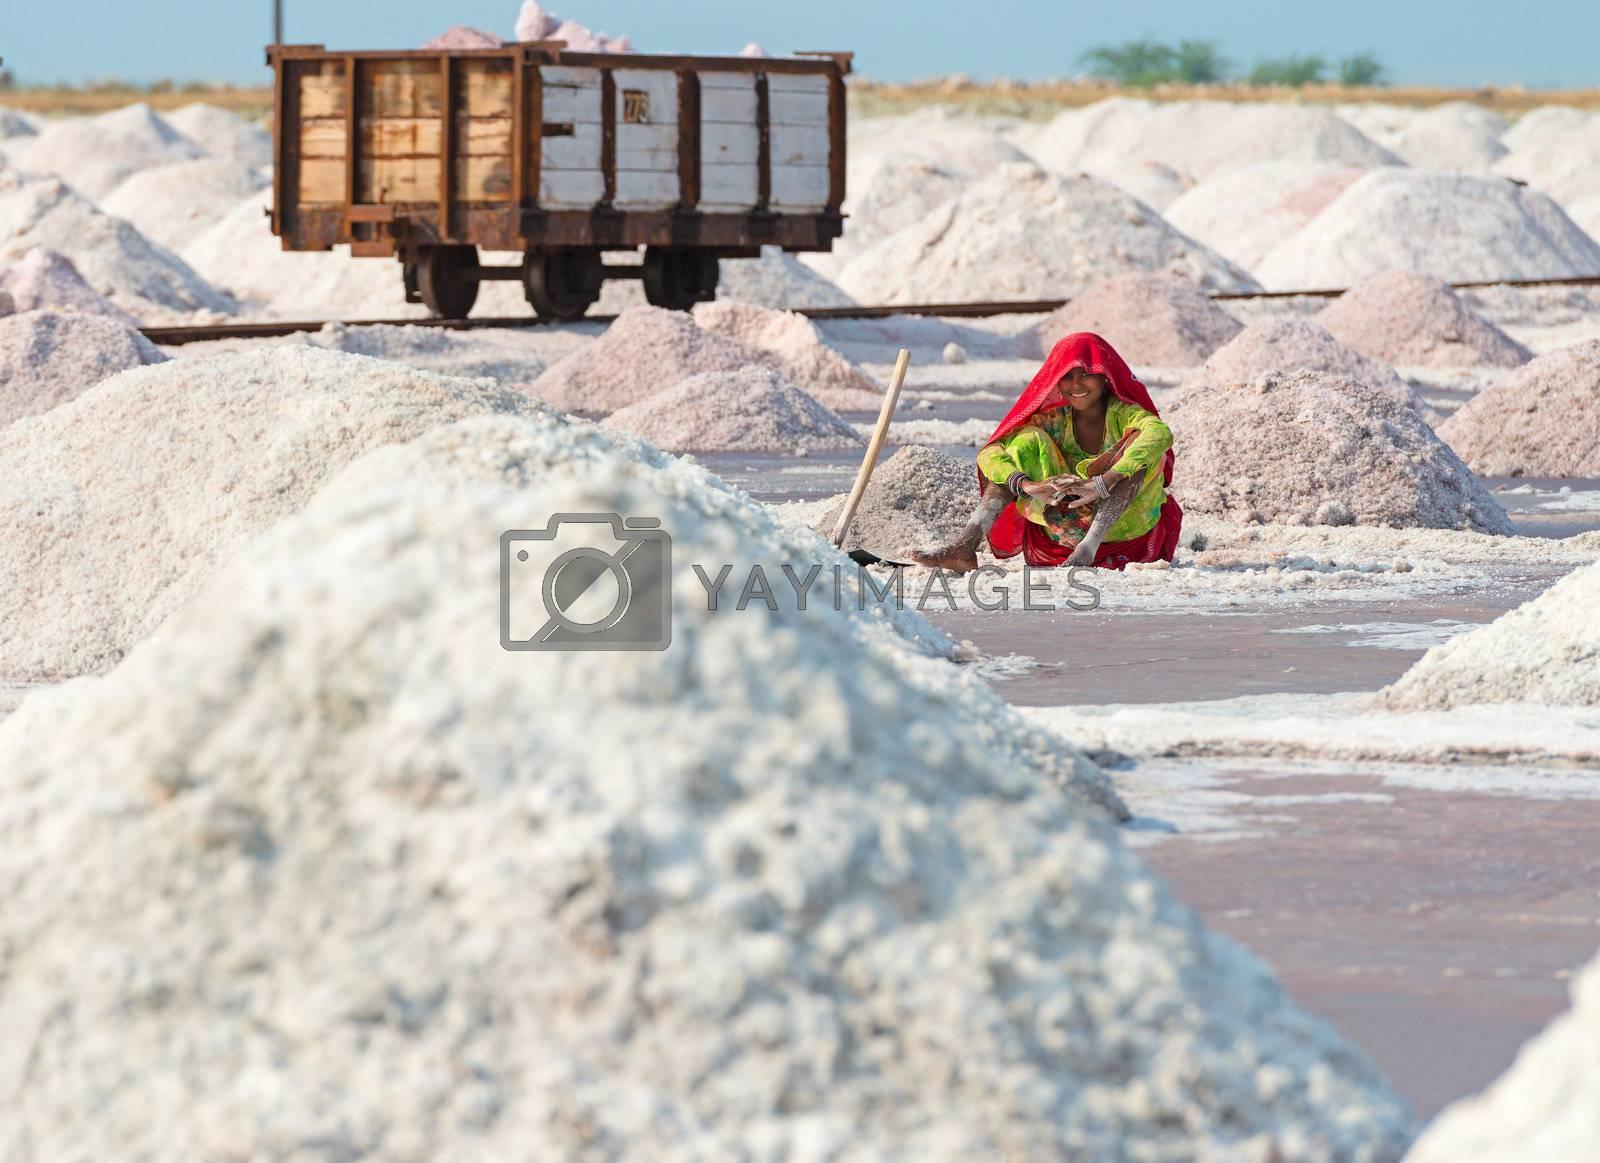 Sambhar, India - Nov 19: Female worker rests in salt farm on Nov 19, 2012 in Sambhar Salt Lake, India. It is India's largest saline lake and where salt has been farmed for a thousand years.